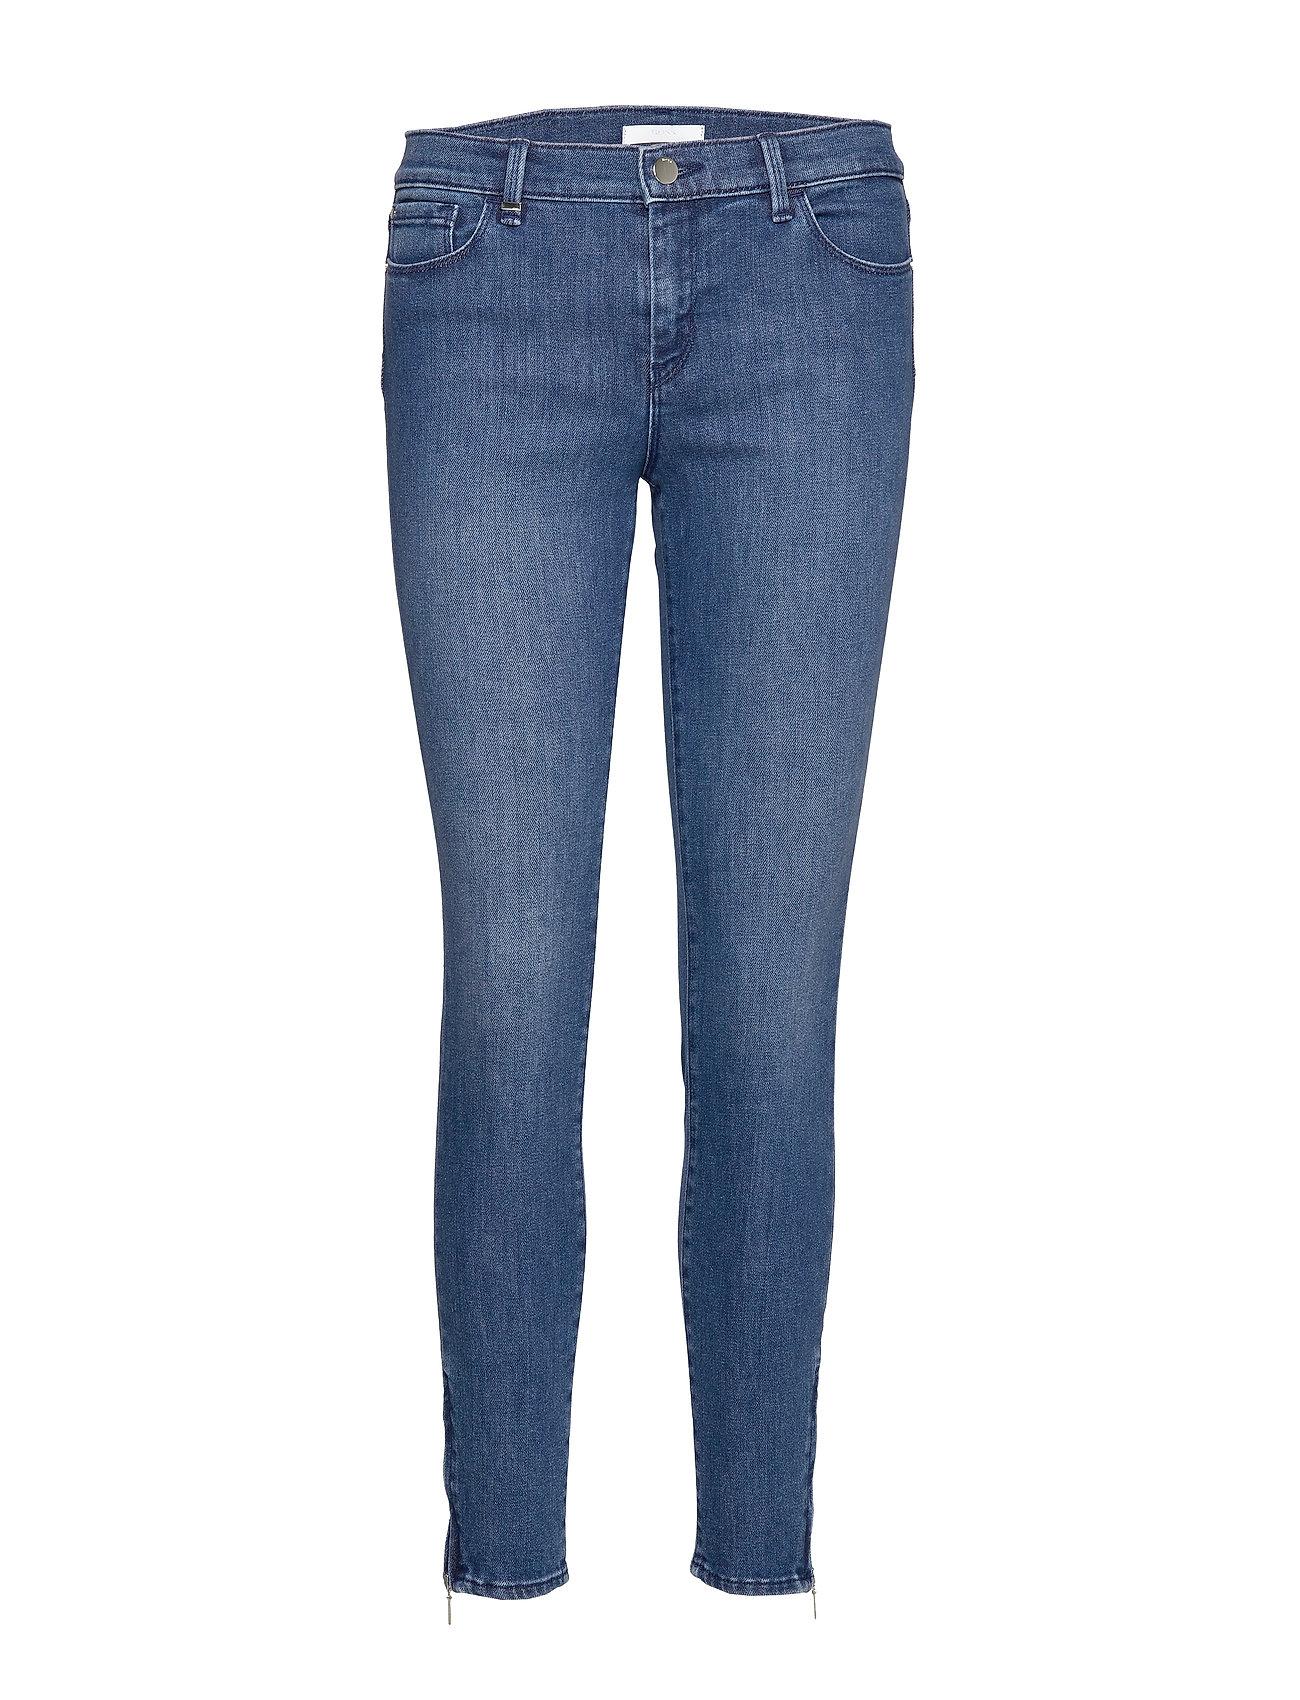 BOSS Business Wear J15 Nafice Zip - MEDIUM BLUE